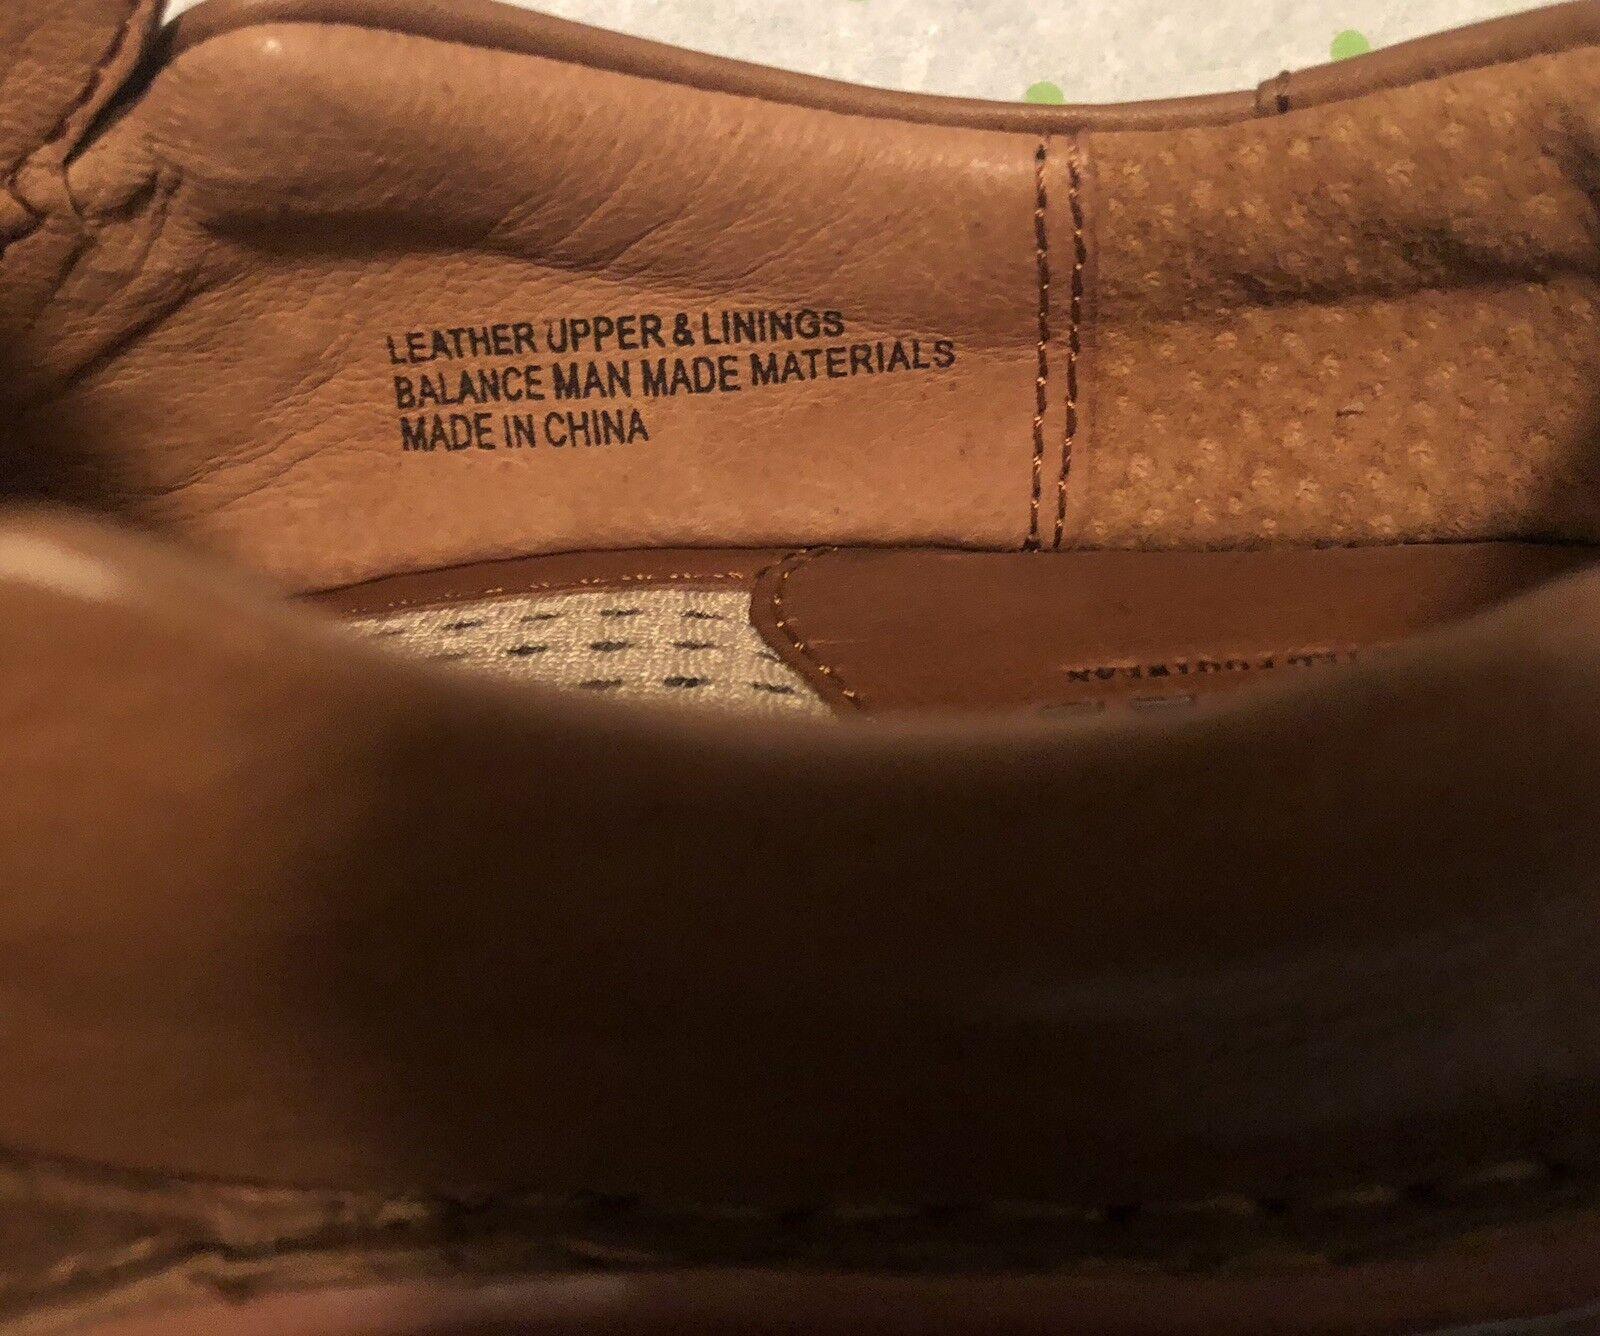 New BORN Madrea W21280 Tan Sz Slip-on Loafers Flats Buckle Leder Damenschuhe Sz Tan 6 36.5 cb2a4c